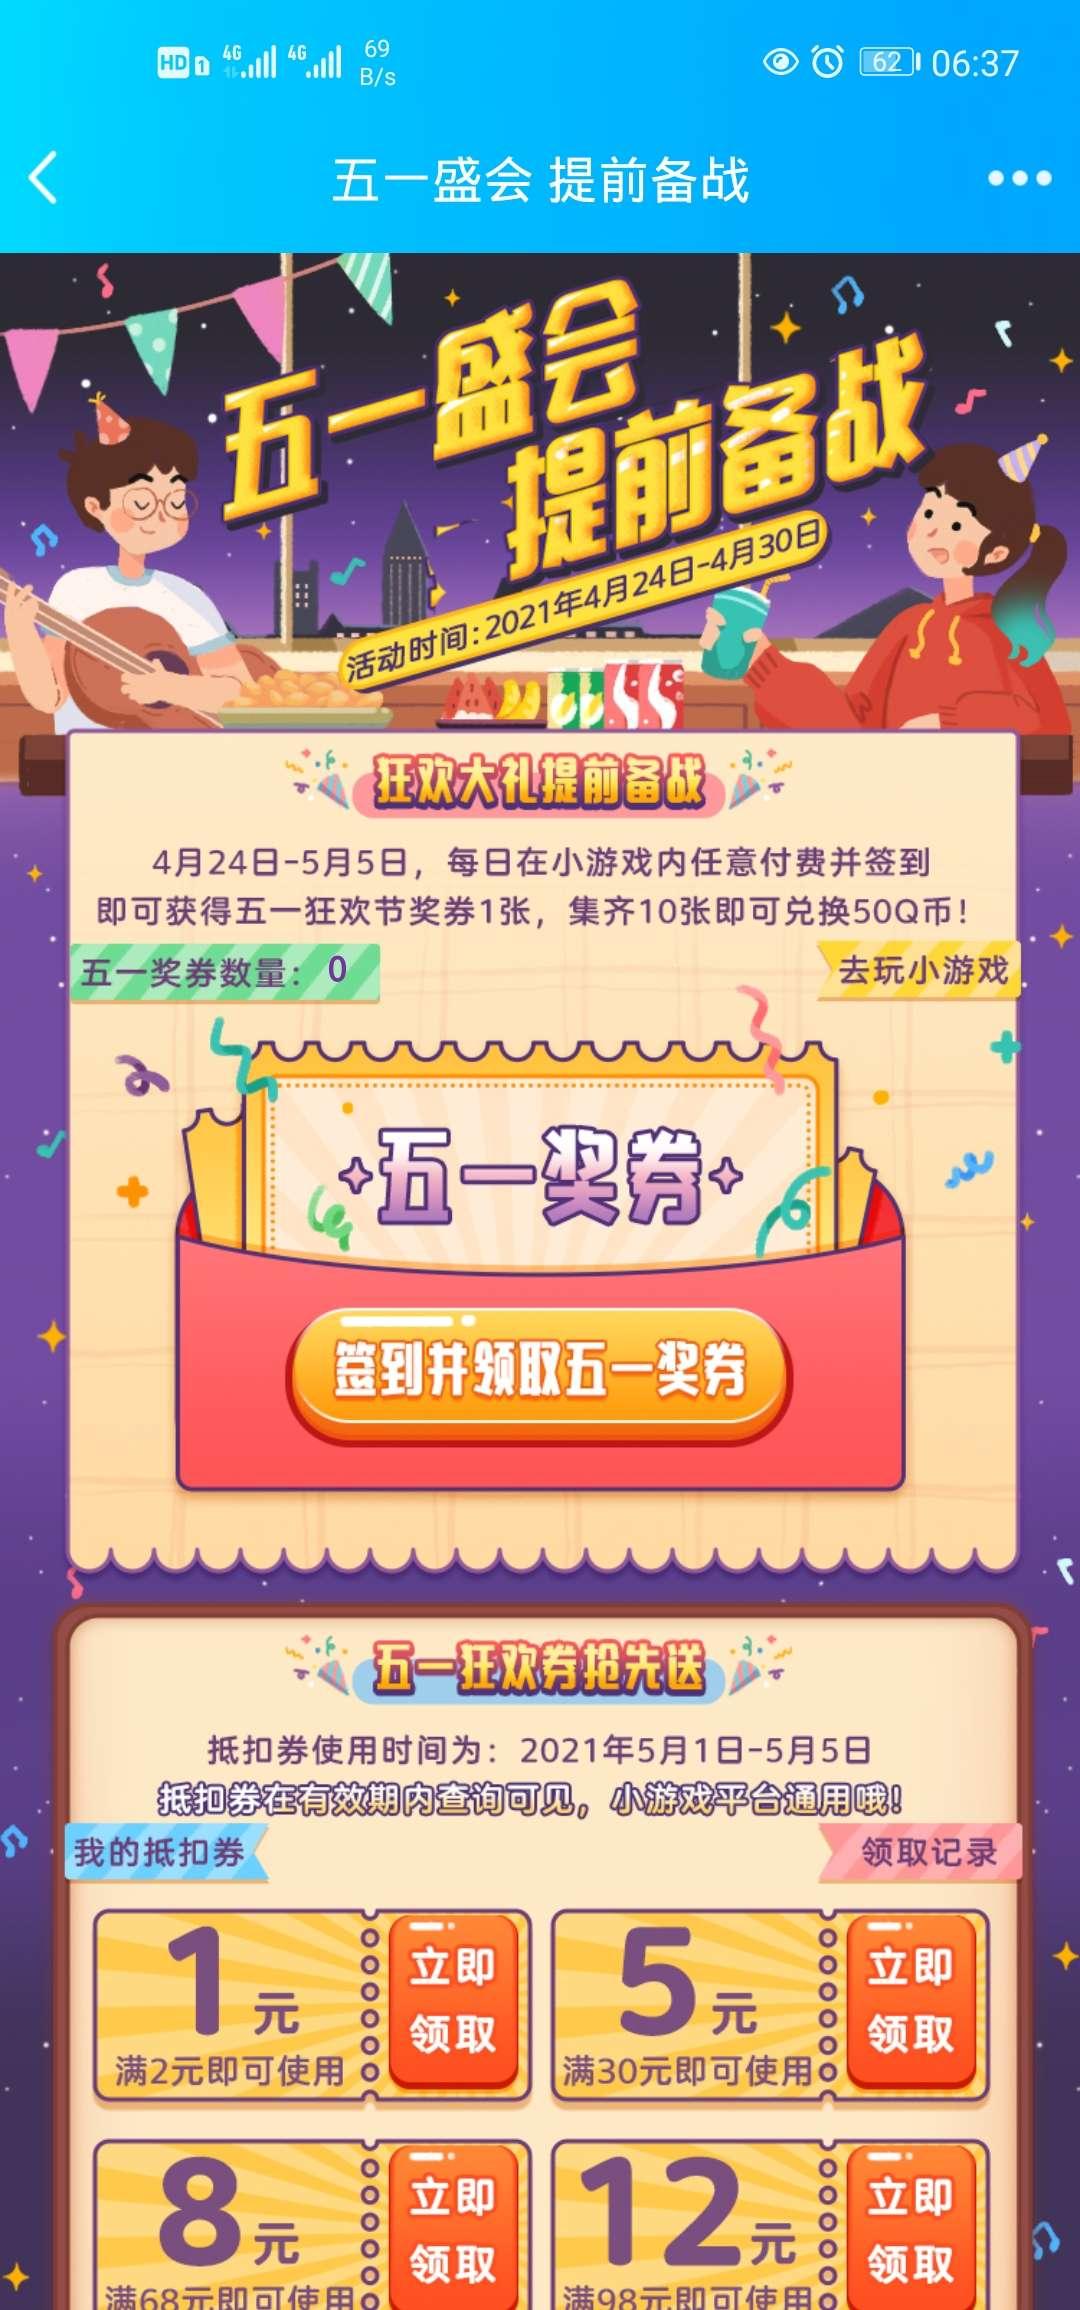 QQ小游戏五一狂欢领50Q币